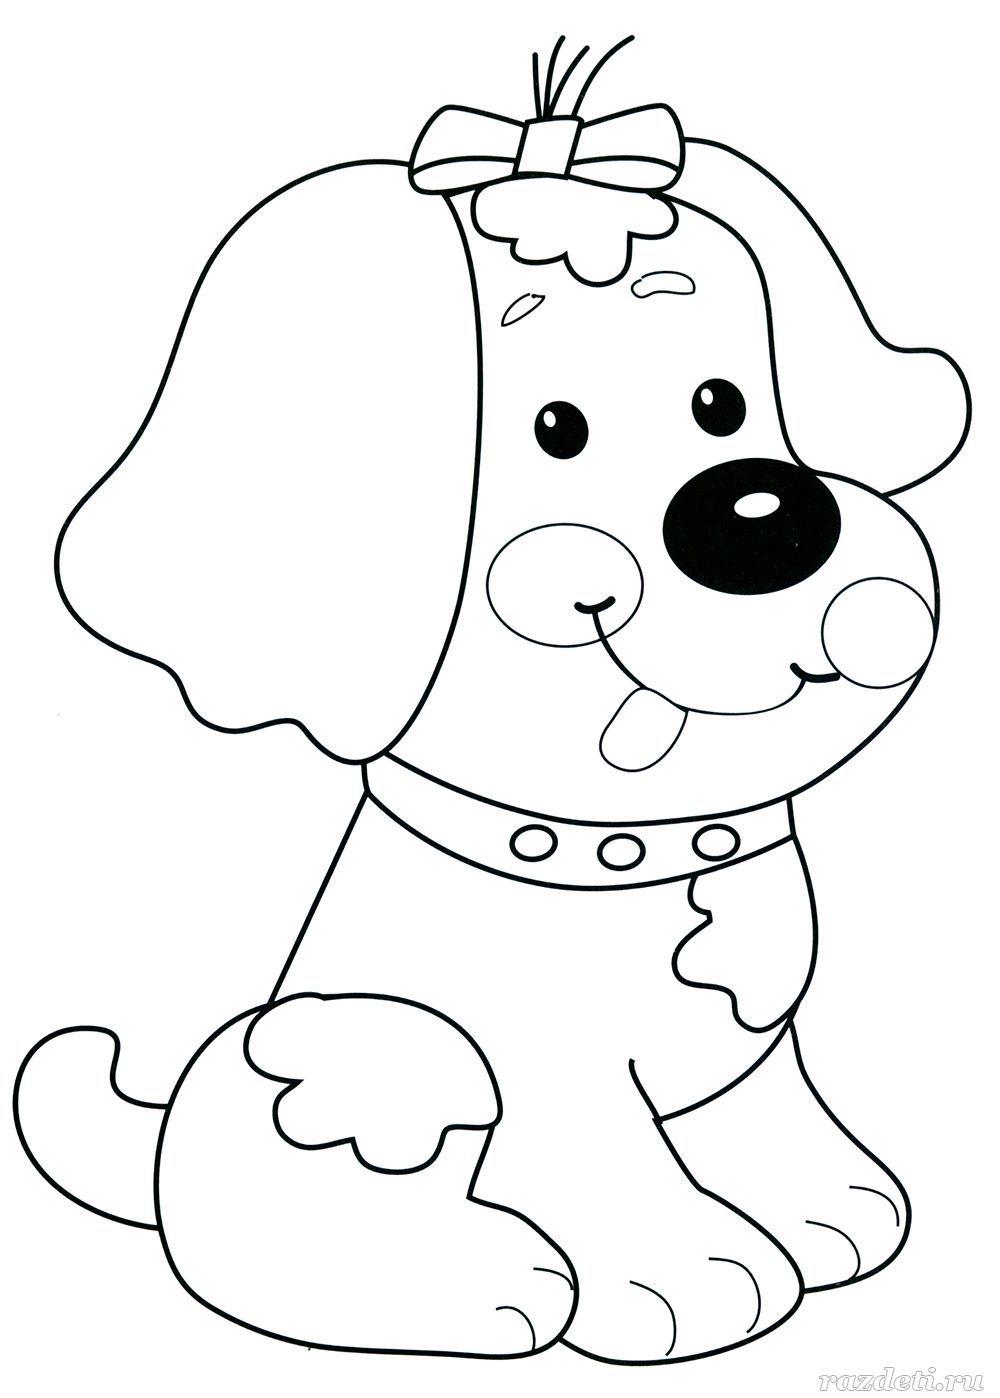 Раскраска для детей. Собака | Раскраски, Шаблоны животных ...